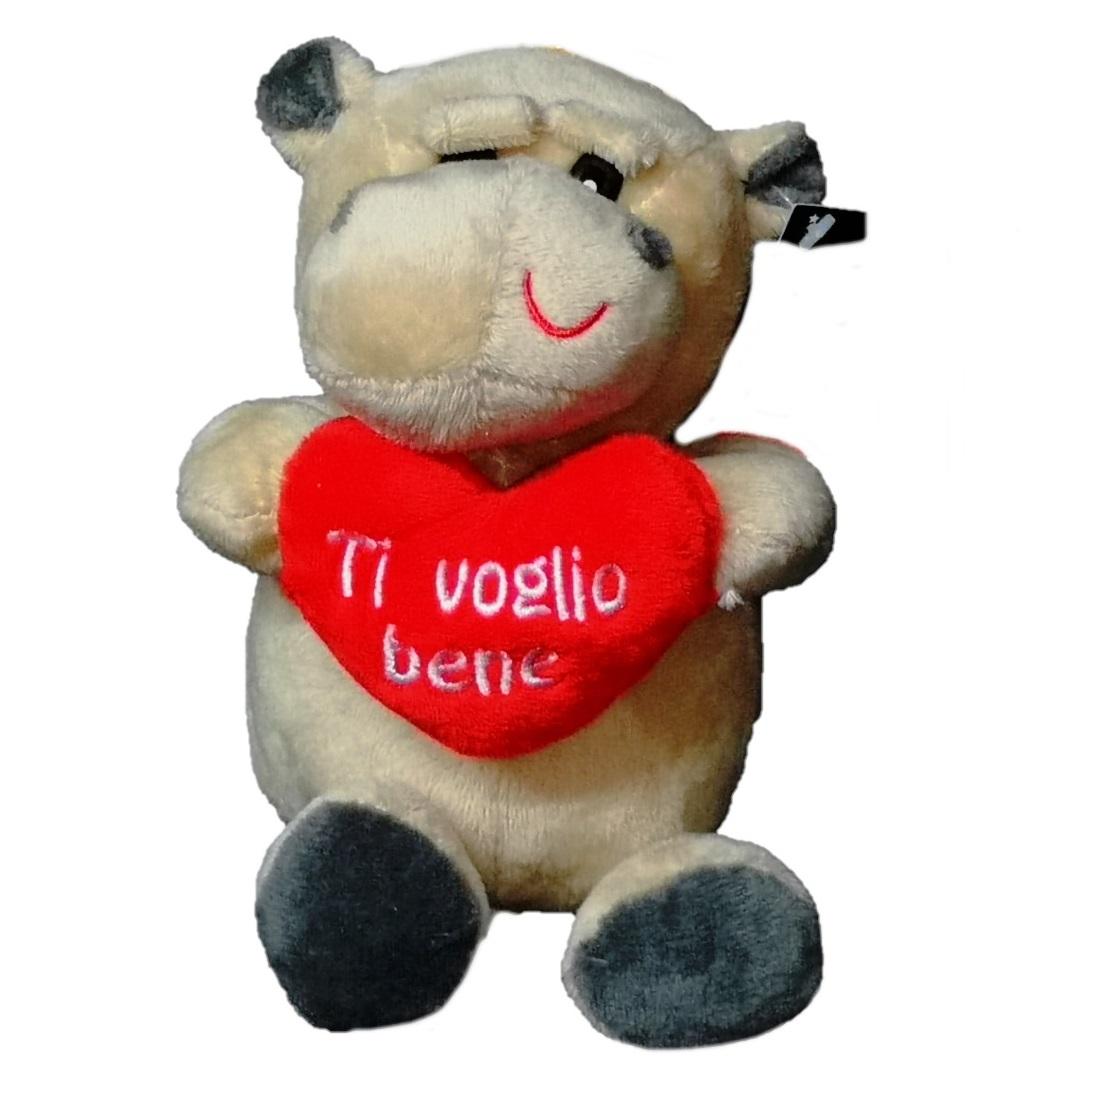 7140a San Valentino The Cartoon World Peluche Ippopotamo San